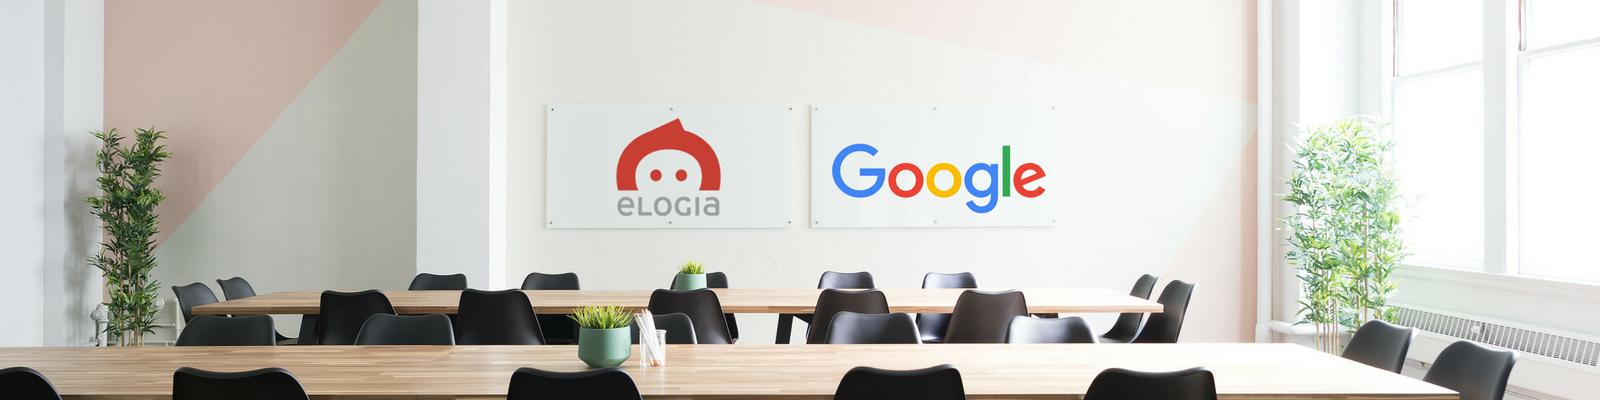 ok-google-elogia-programa-mobile-vanguard.png